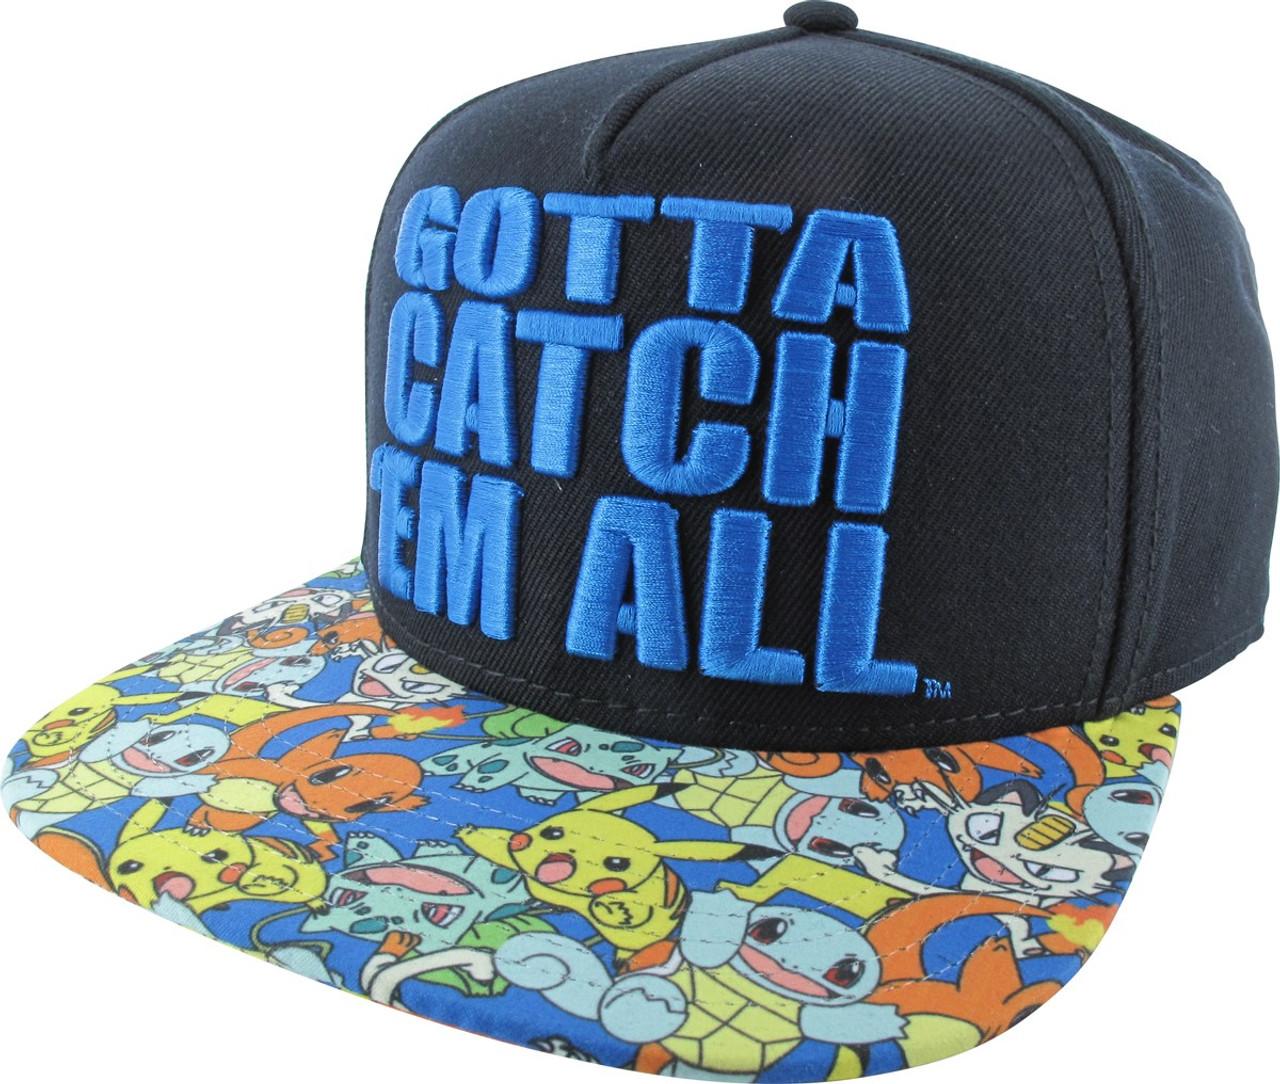 pokemon-catch-em-all-embroidered-snapback-hat -22  18346.1512327300.jpg c 2 imbypass on c513d1df29e7